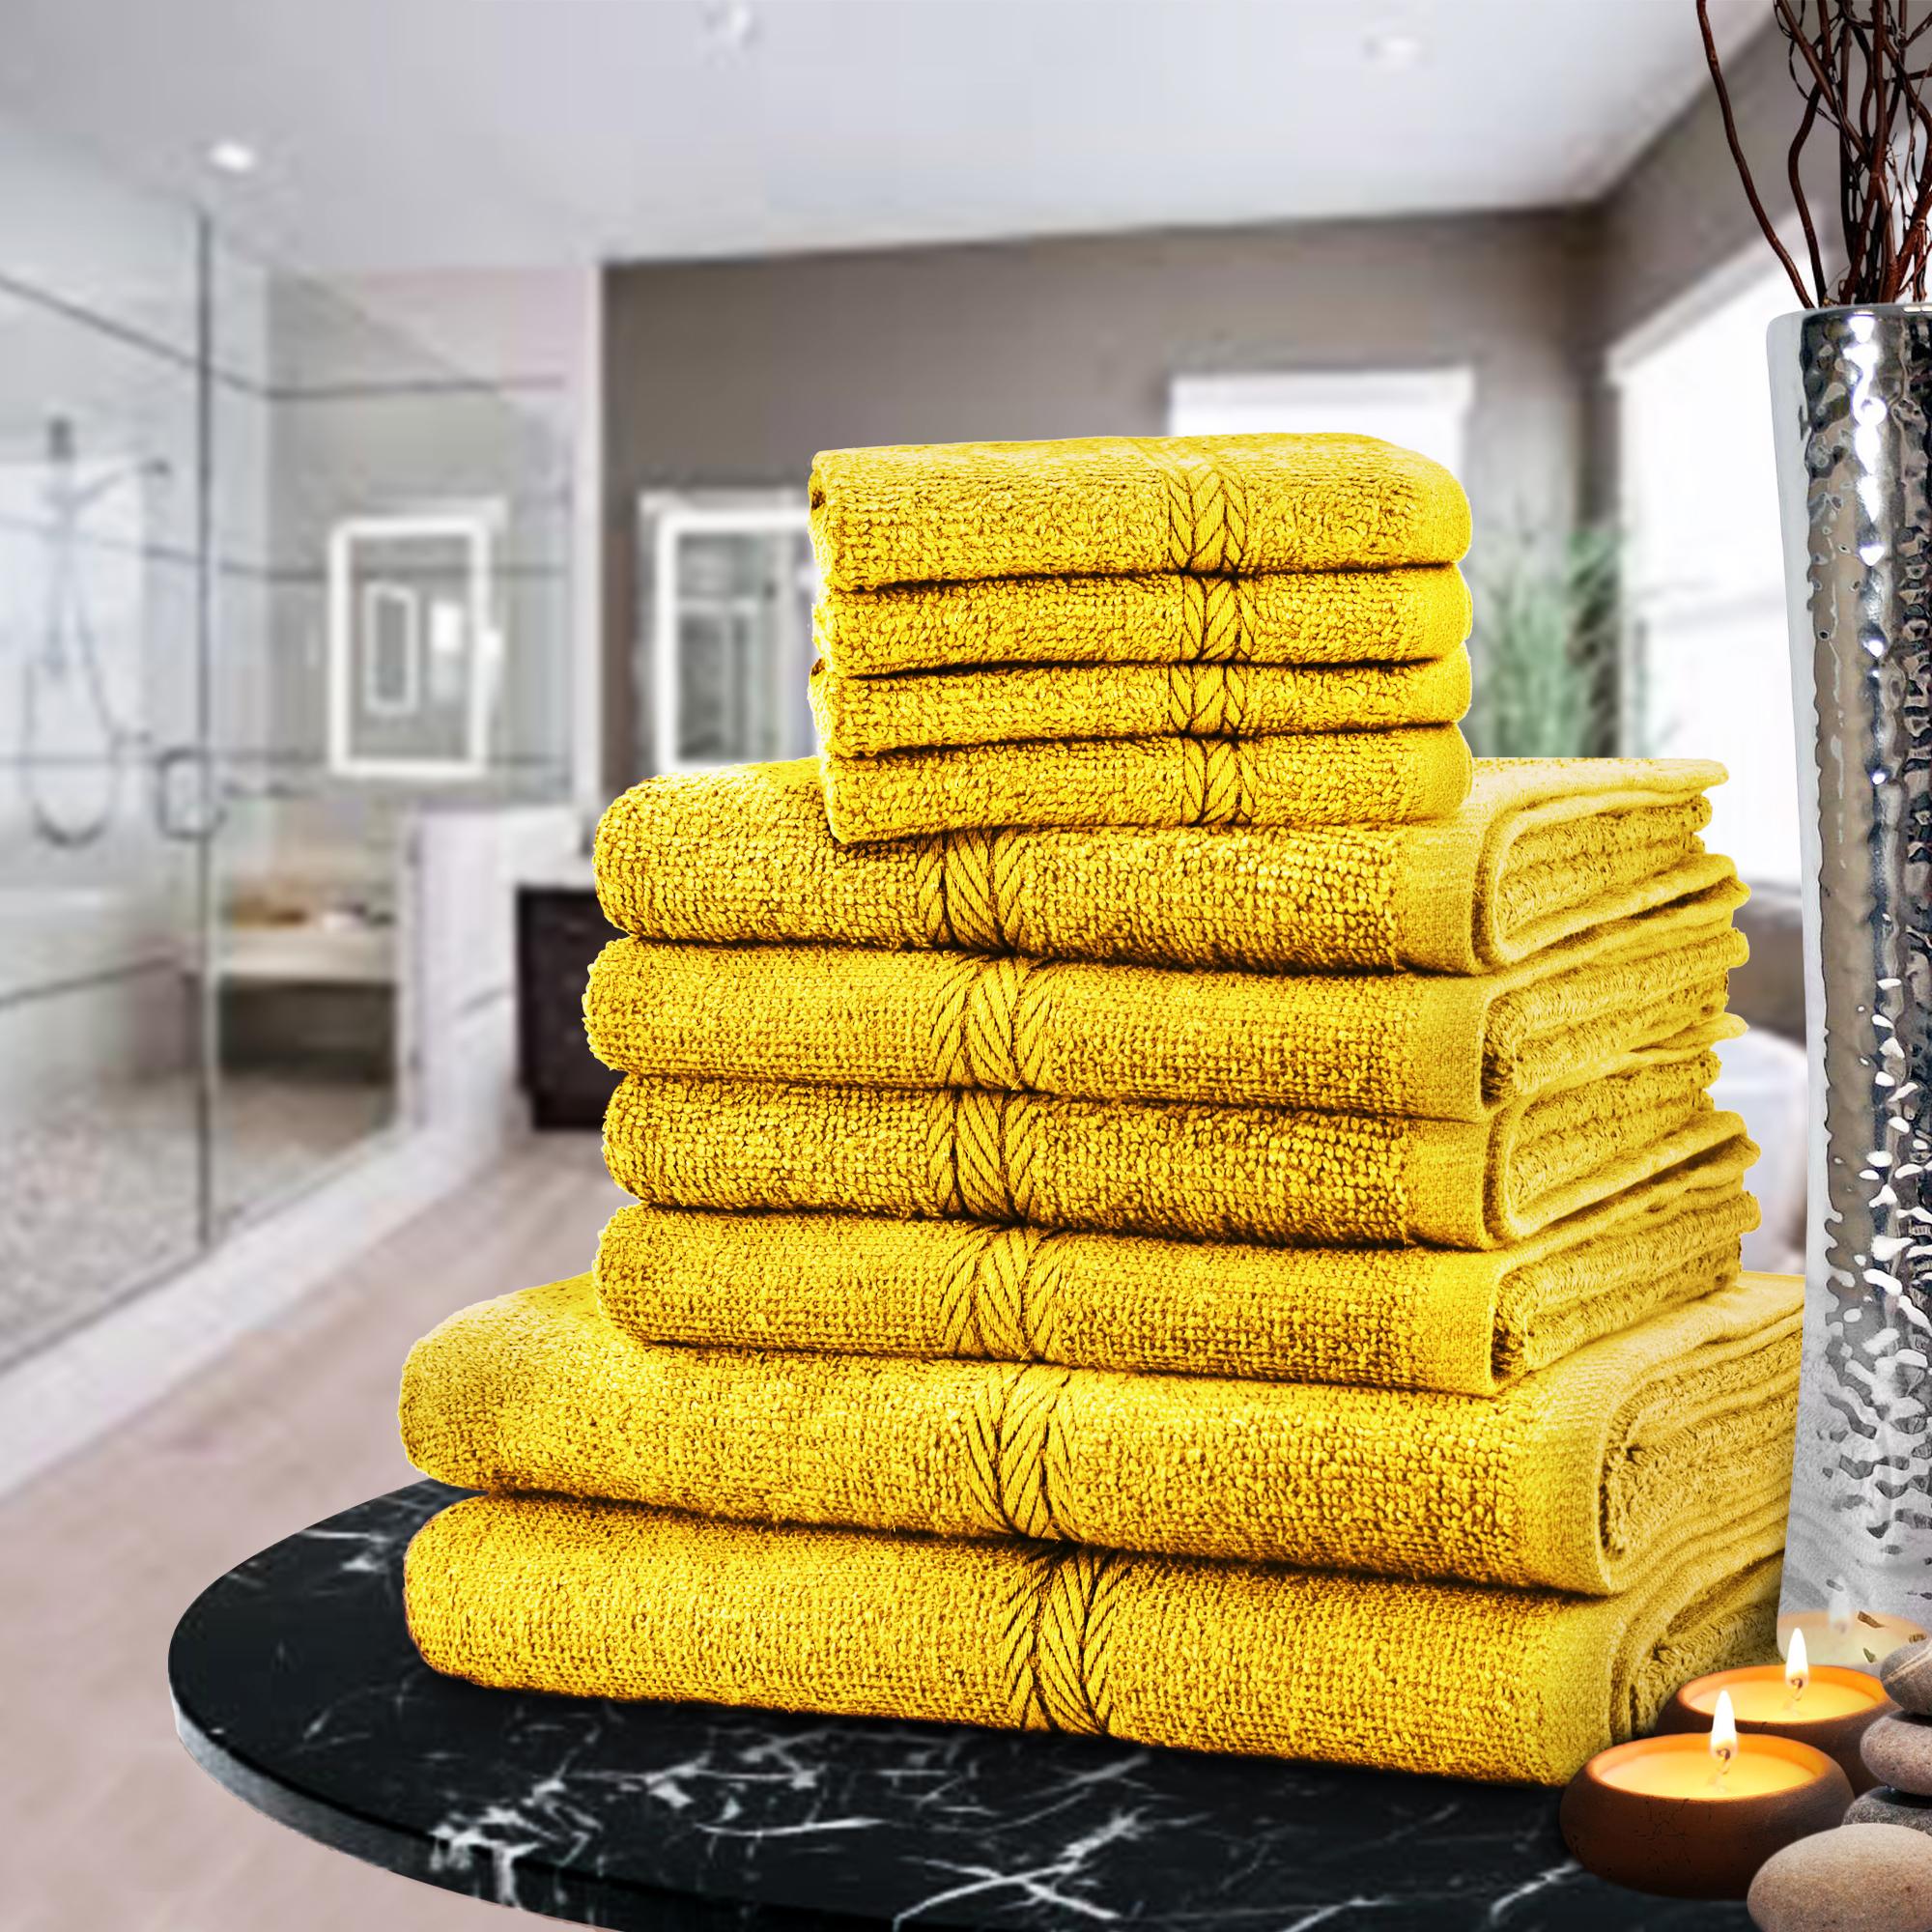 Bathroom Towels Luxury: LUXURY TOWEL BALE SET 100% EGYPTIAN COTTON 10PC FACE HAND